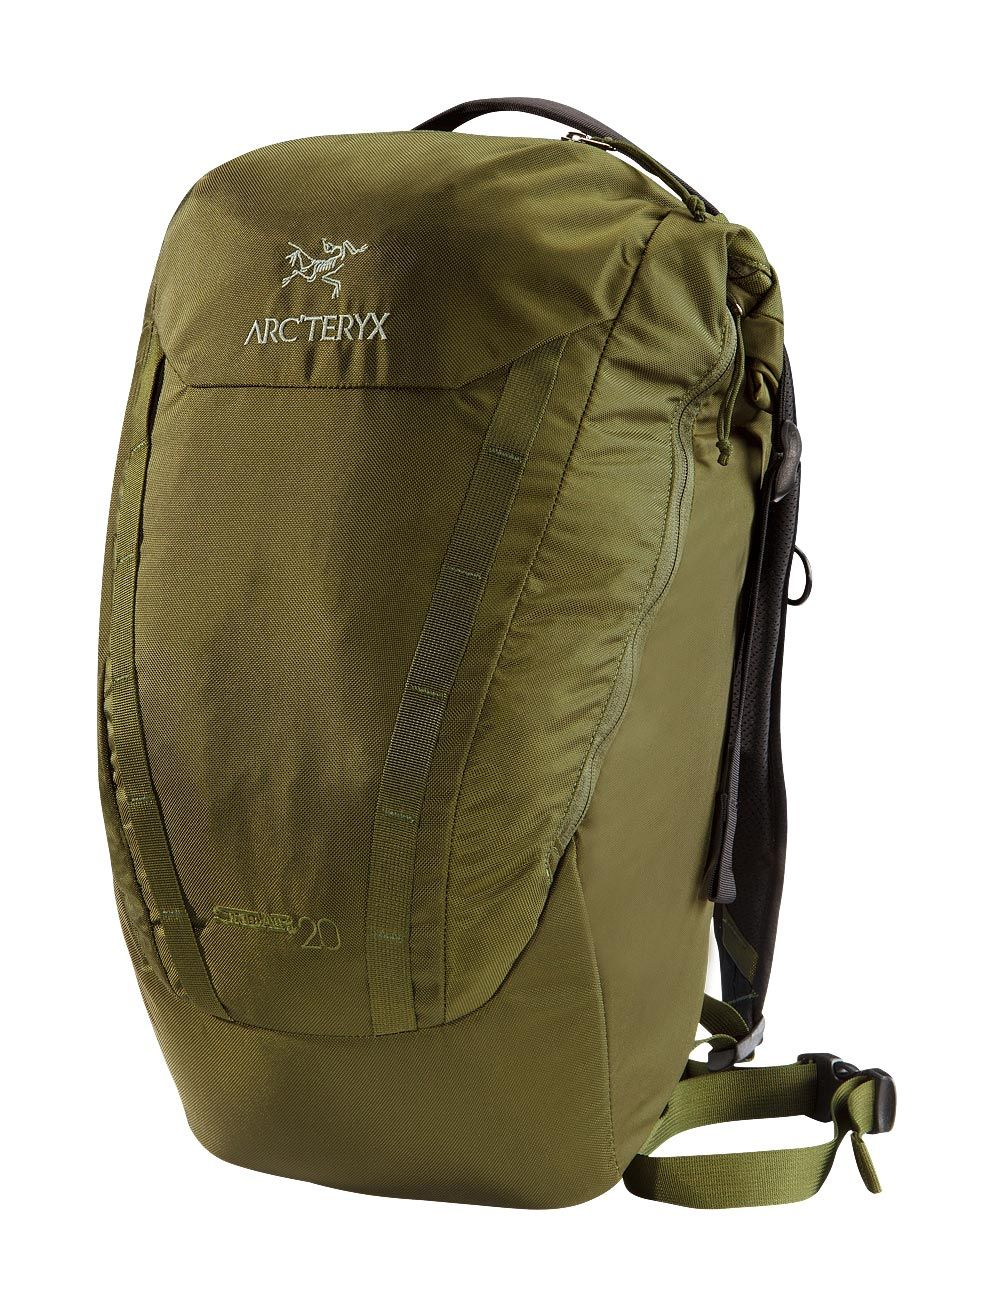 arcteryx backpack sale canada